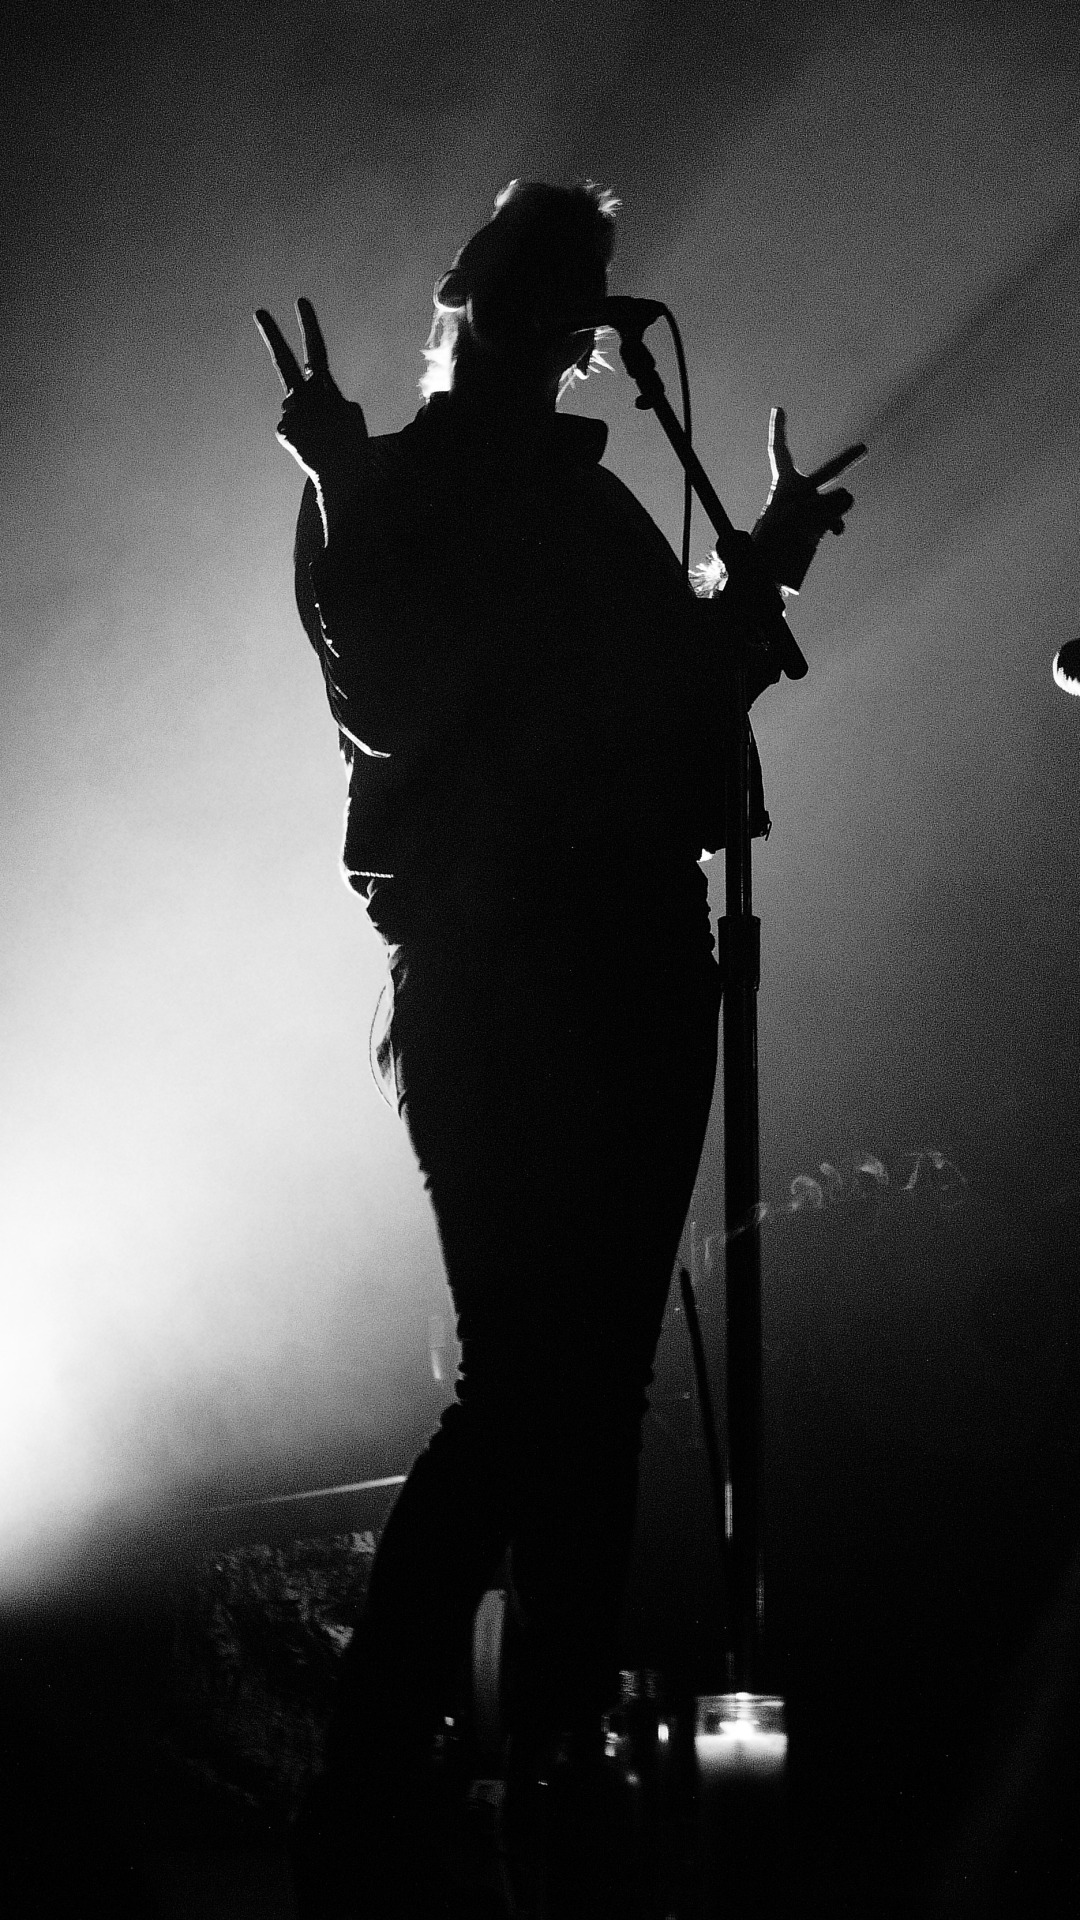 10/19/12 - Montreal, Canada, Metropolis - Page 2 Tumblr_muwlldGzqp1rpdse2o3_1280